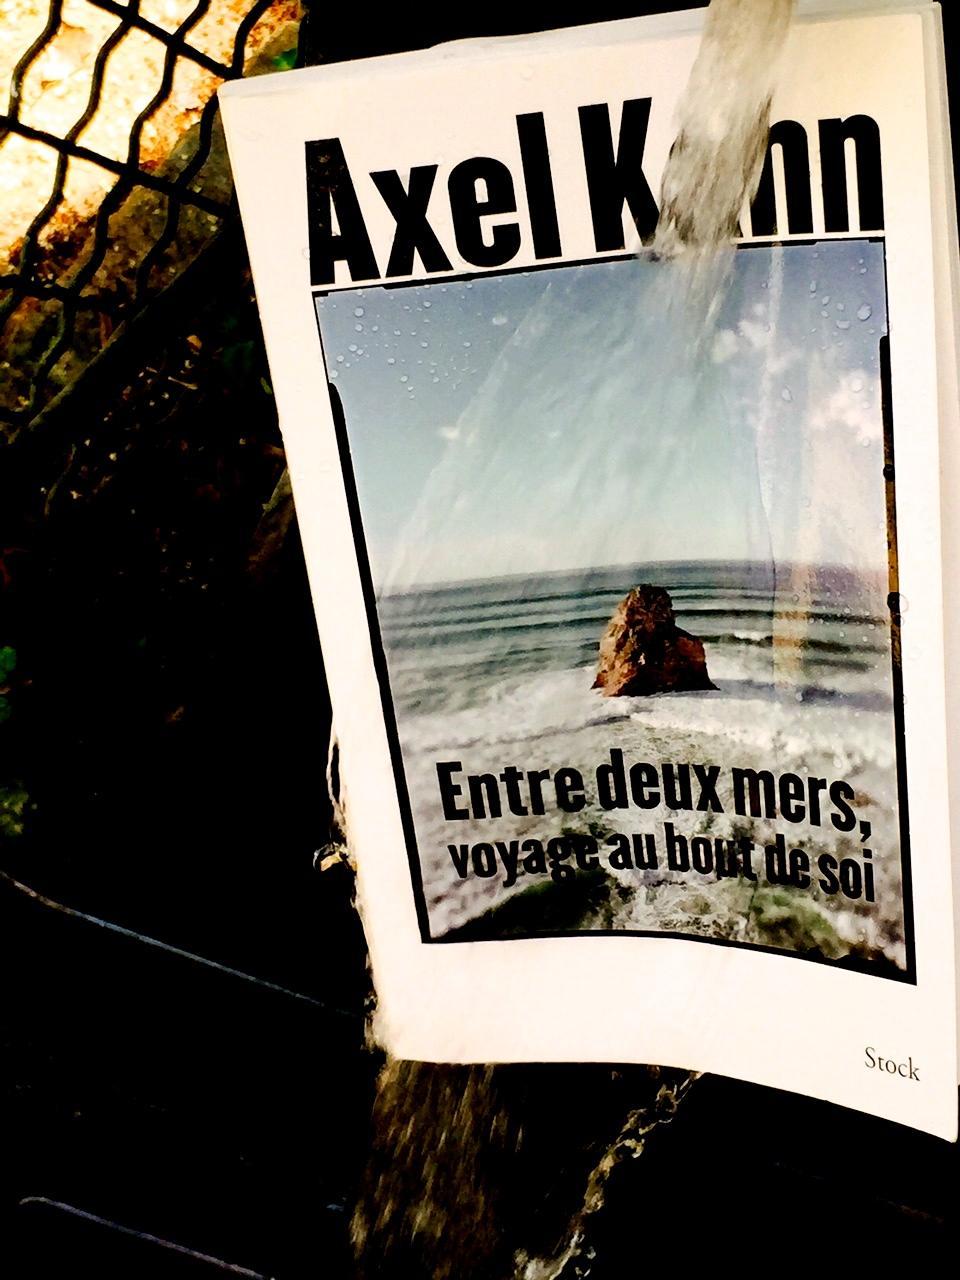 Axel Kahn.